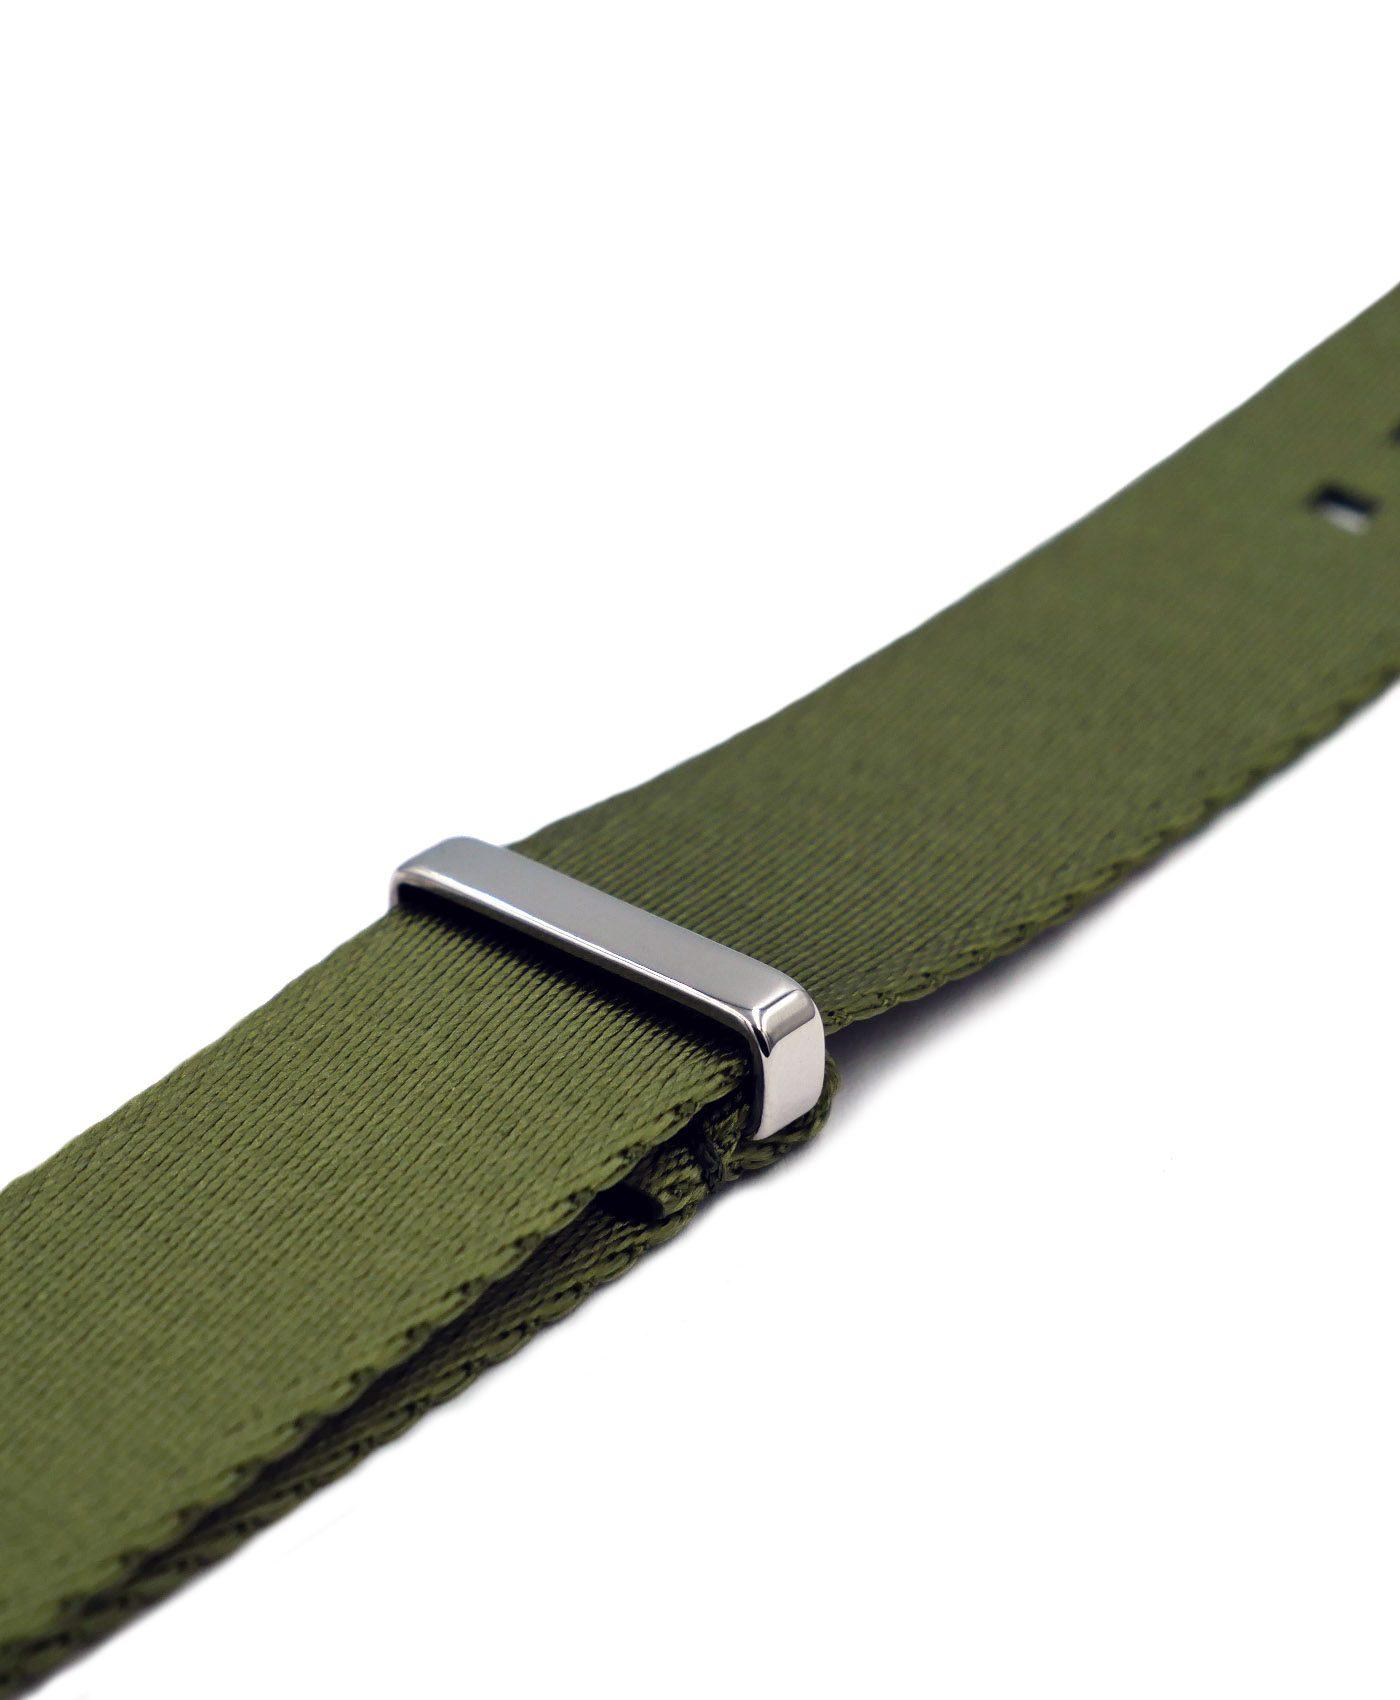 Premium 1.2 mm seat belt polished NATO Strap green side by WatchBandit